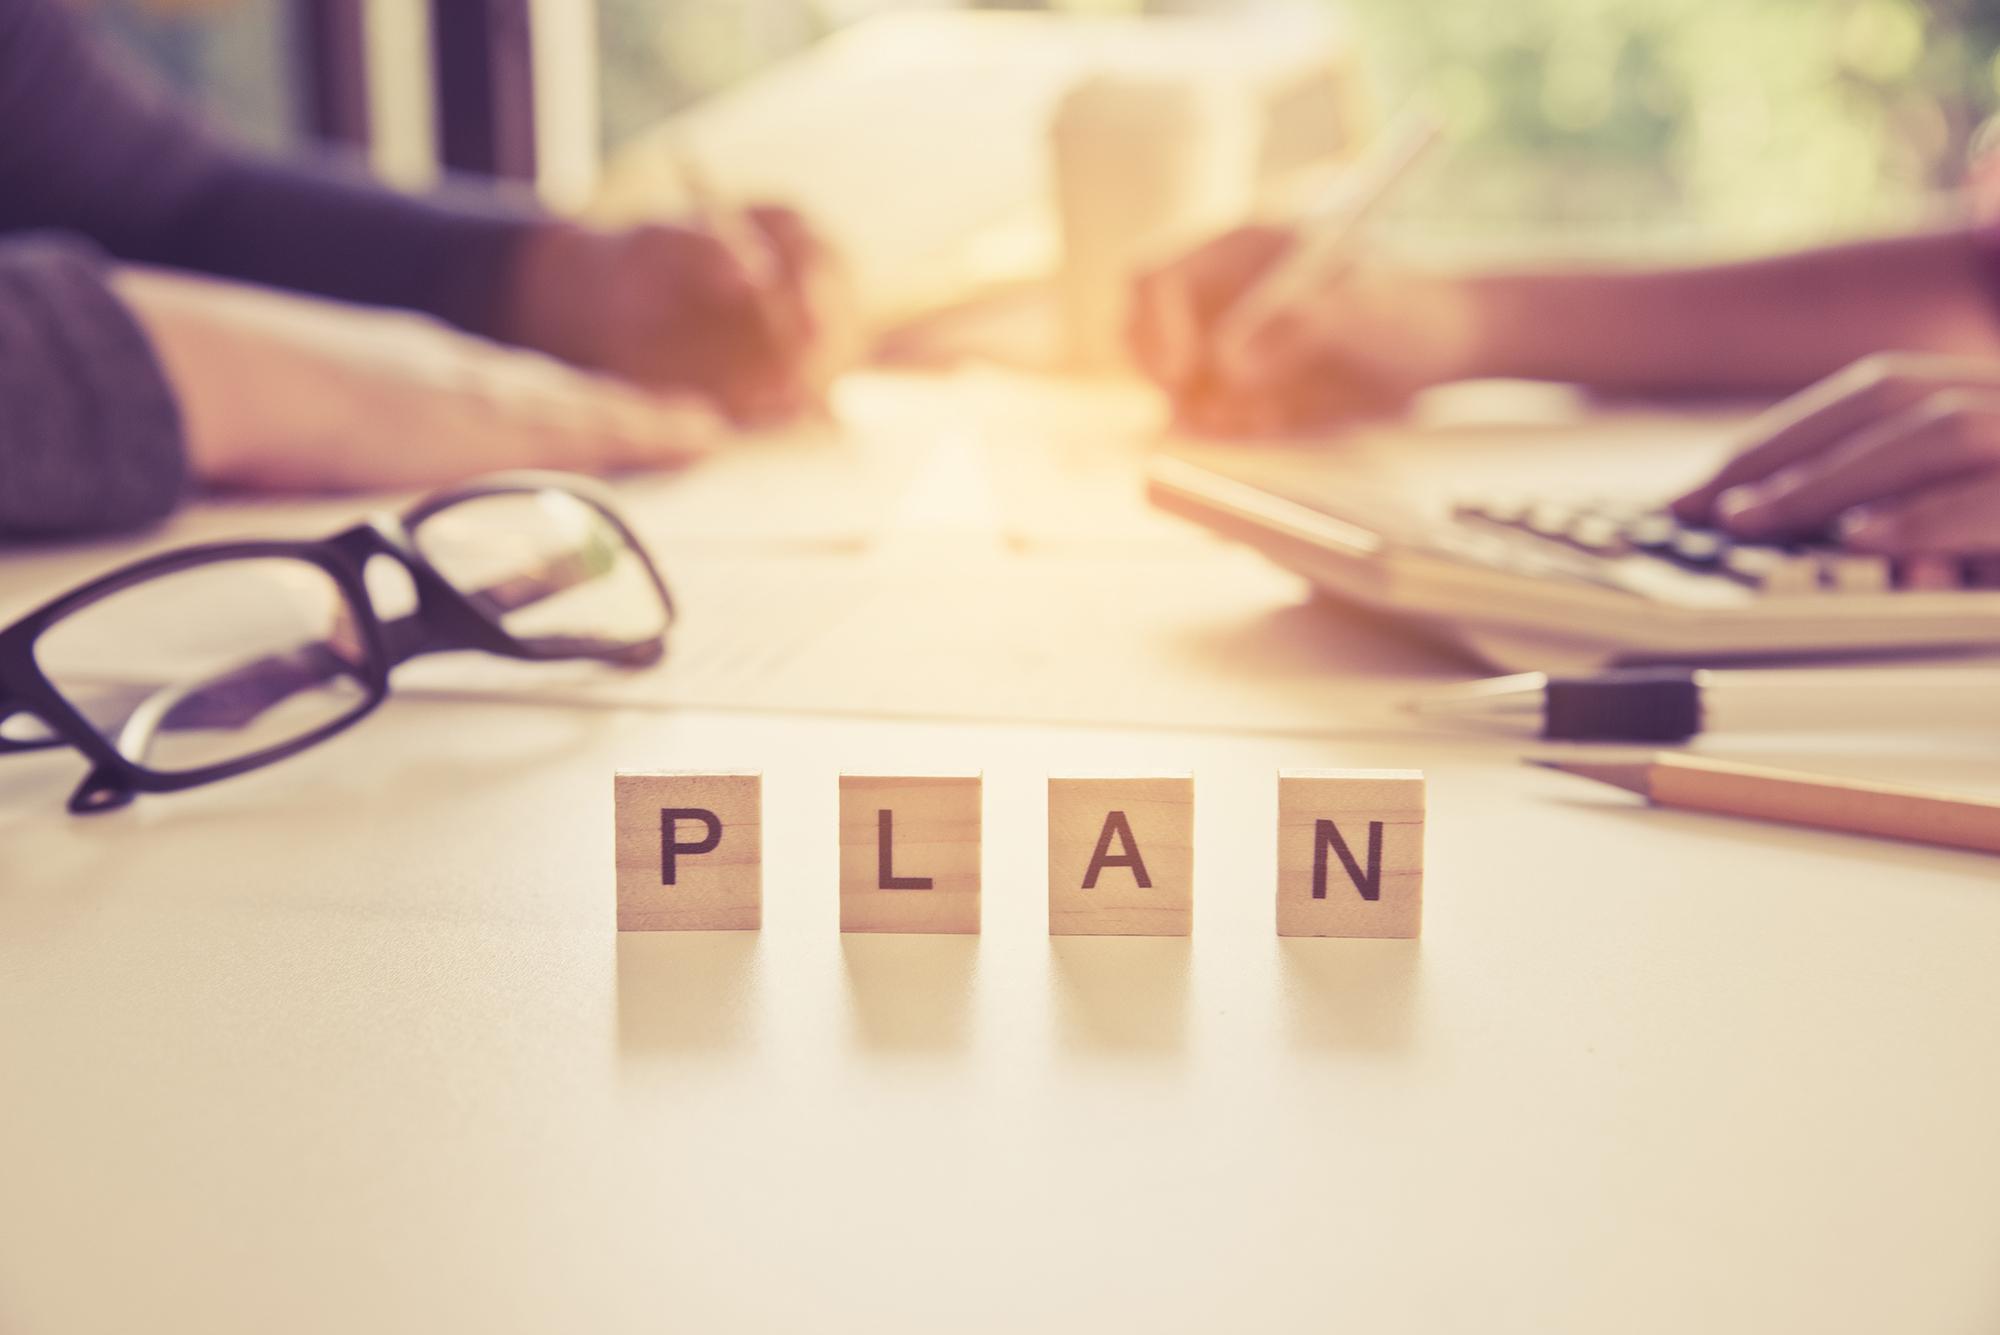 planificación comunicación digital